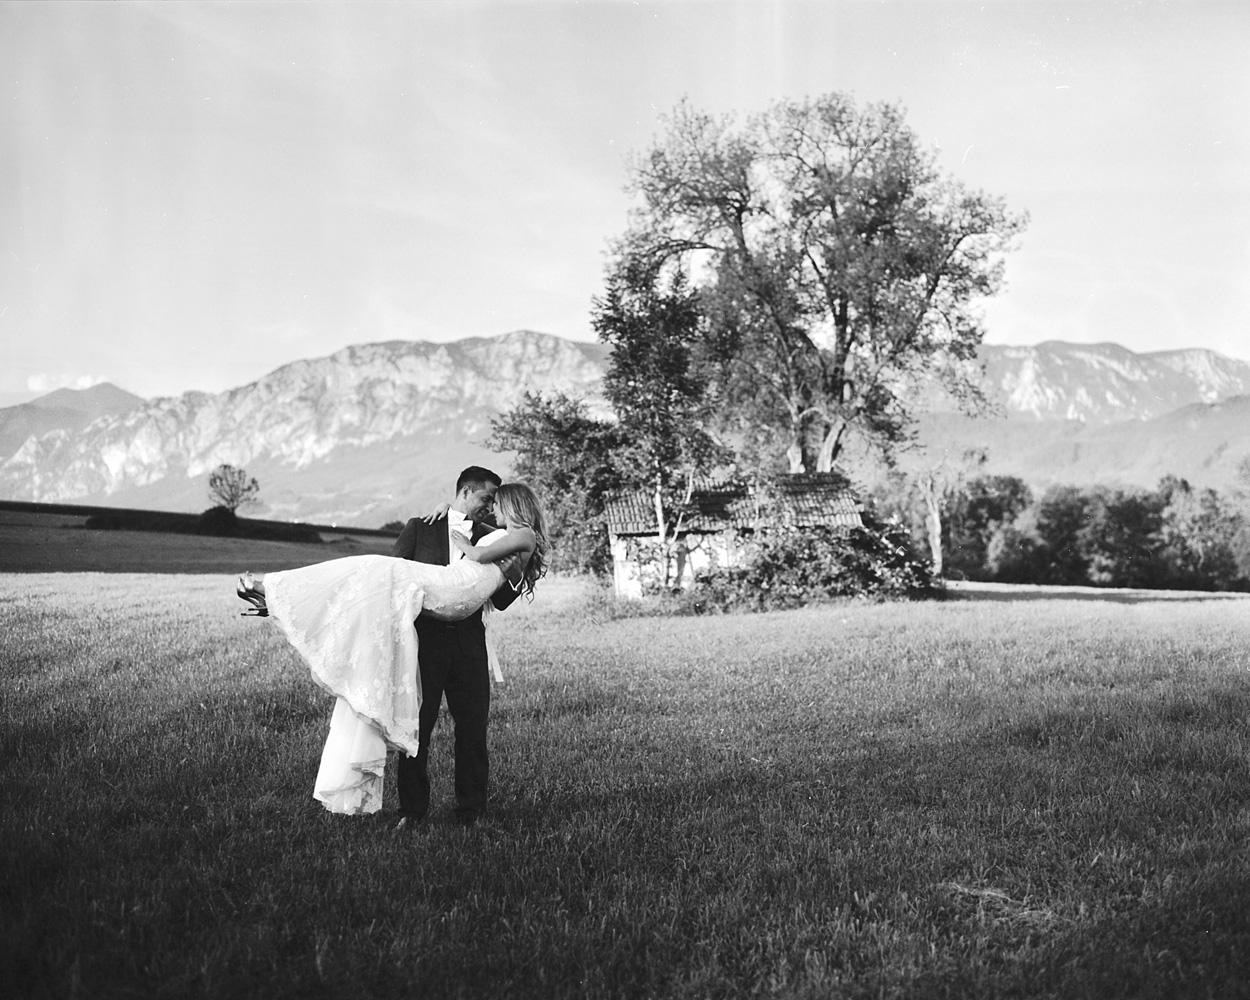 Analóg esküvői fotók